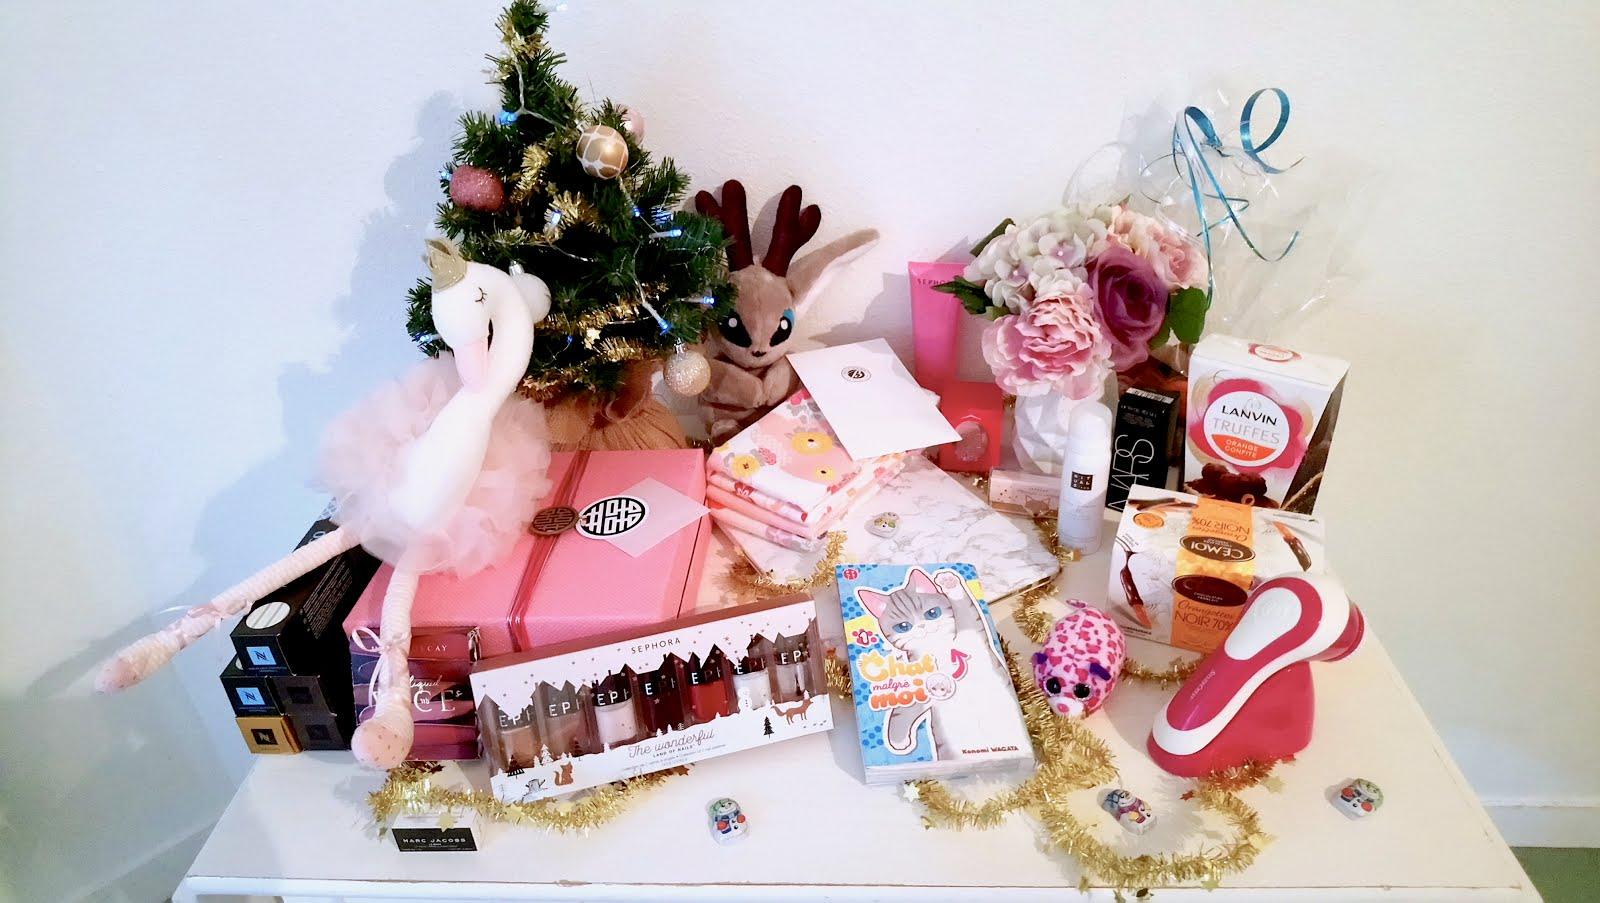 Beauty makes my happiness mes cadeaux de no l 2017 - Mes cadeaux de noel ...